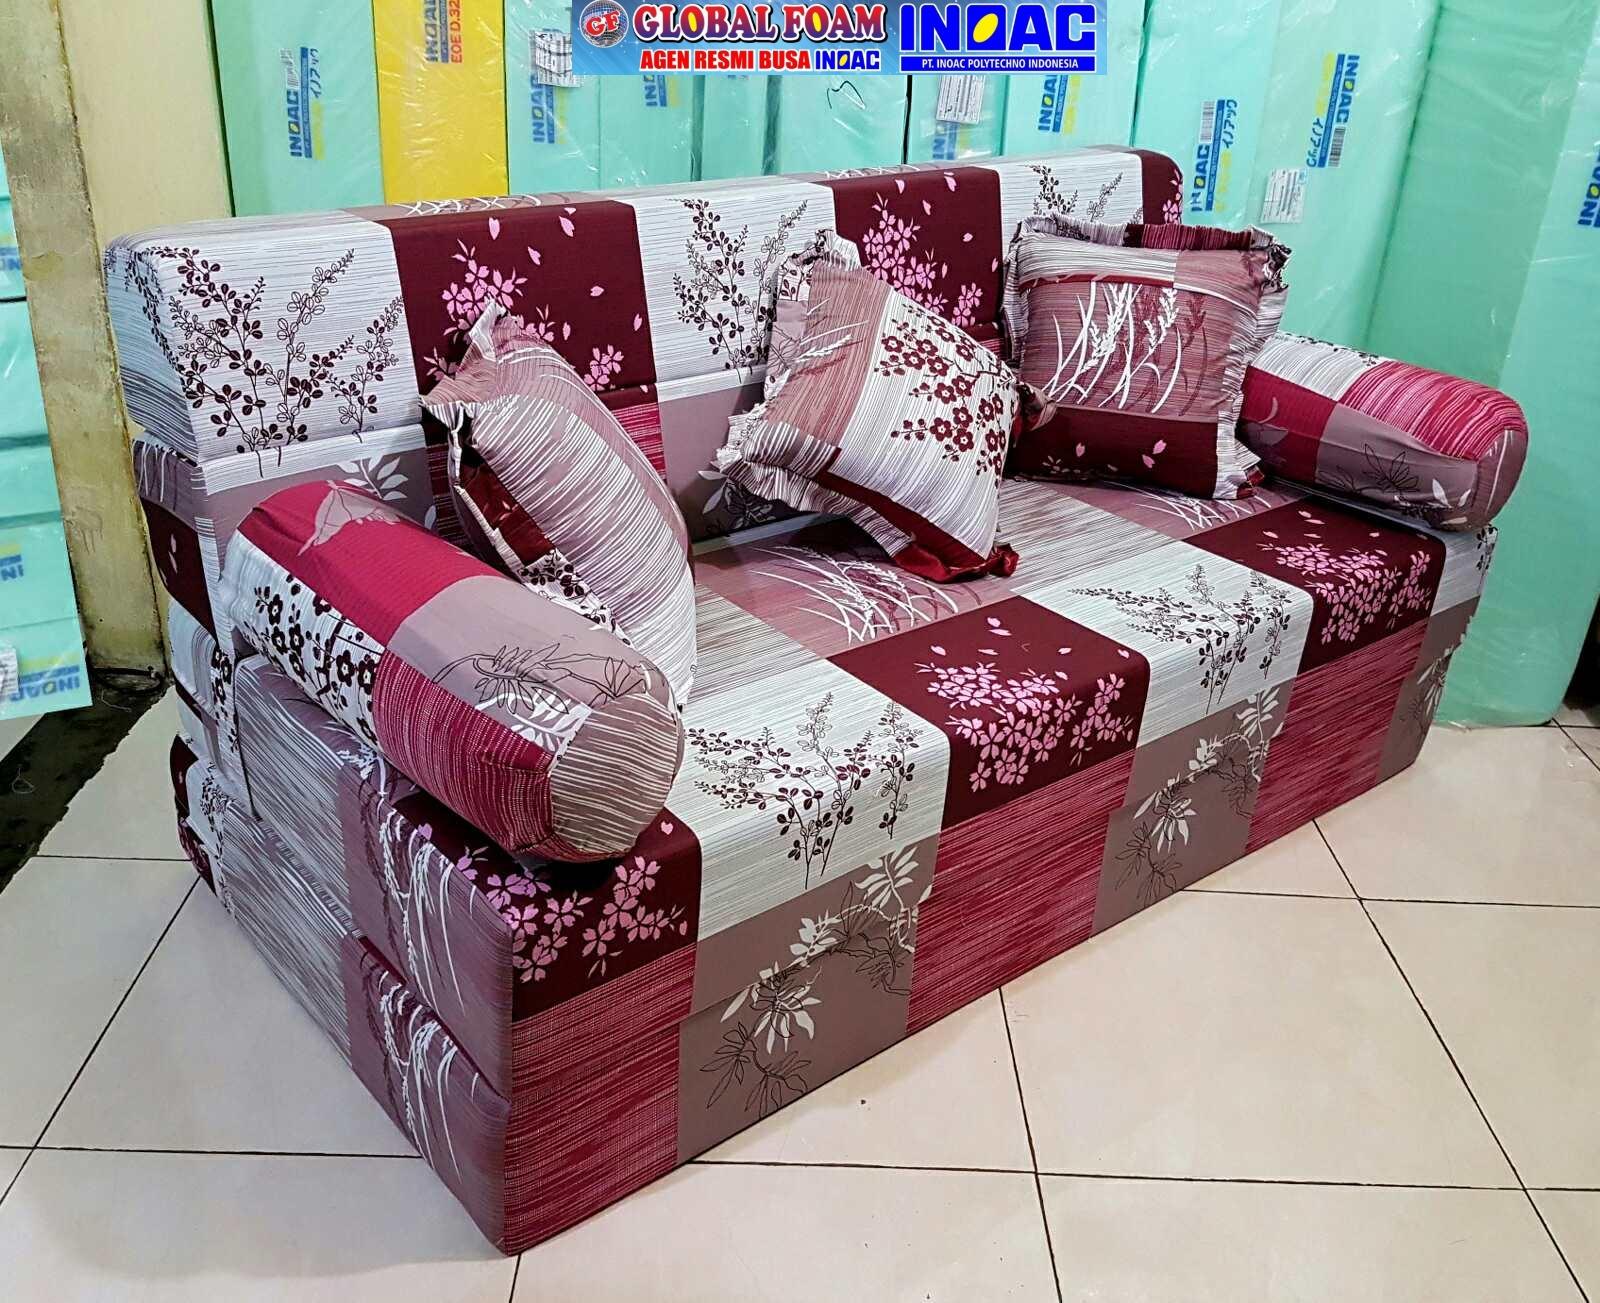 harga sofa bed inoac no 1 white denim slipcovers 2019 distributor dan agen resmi kasur